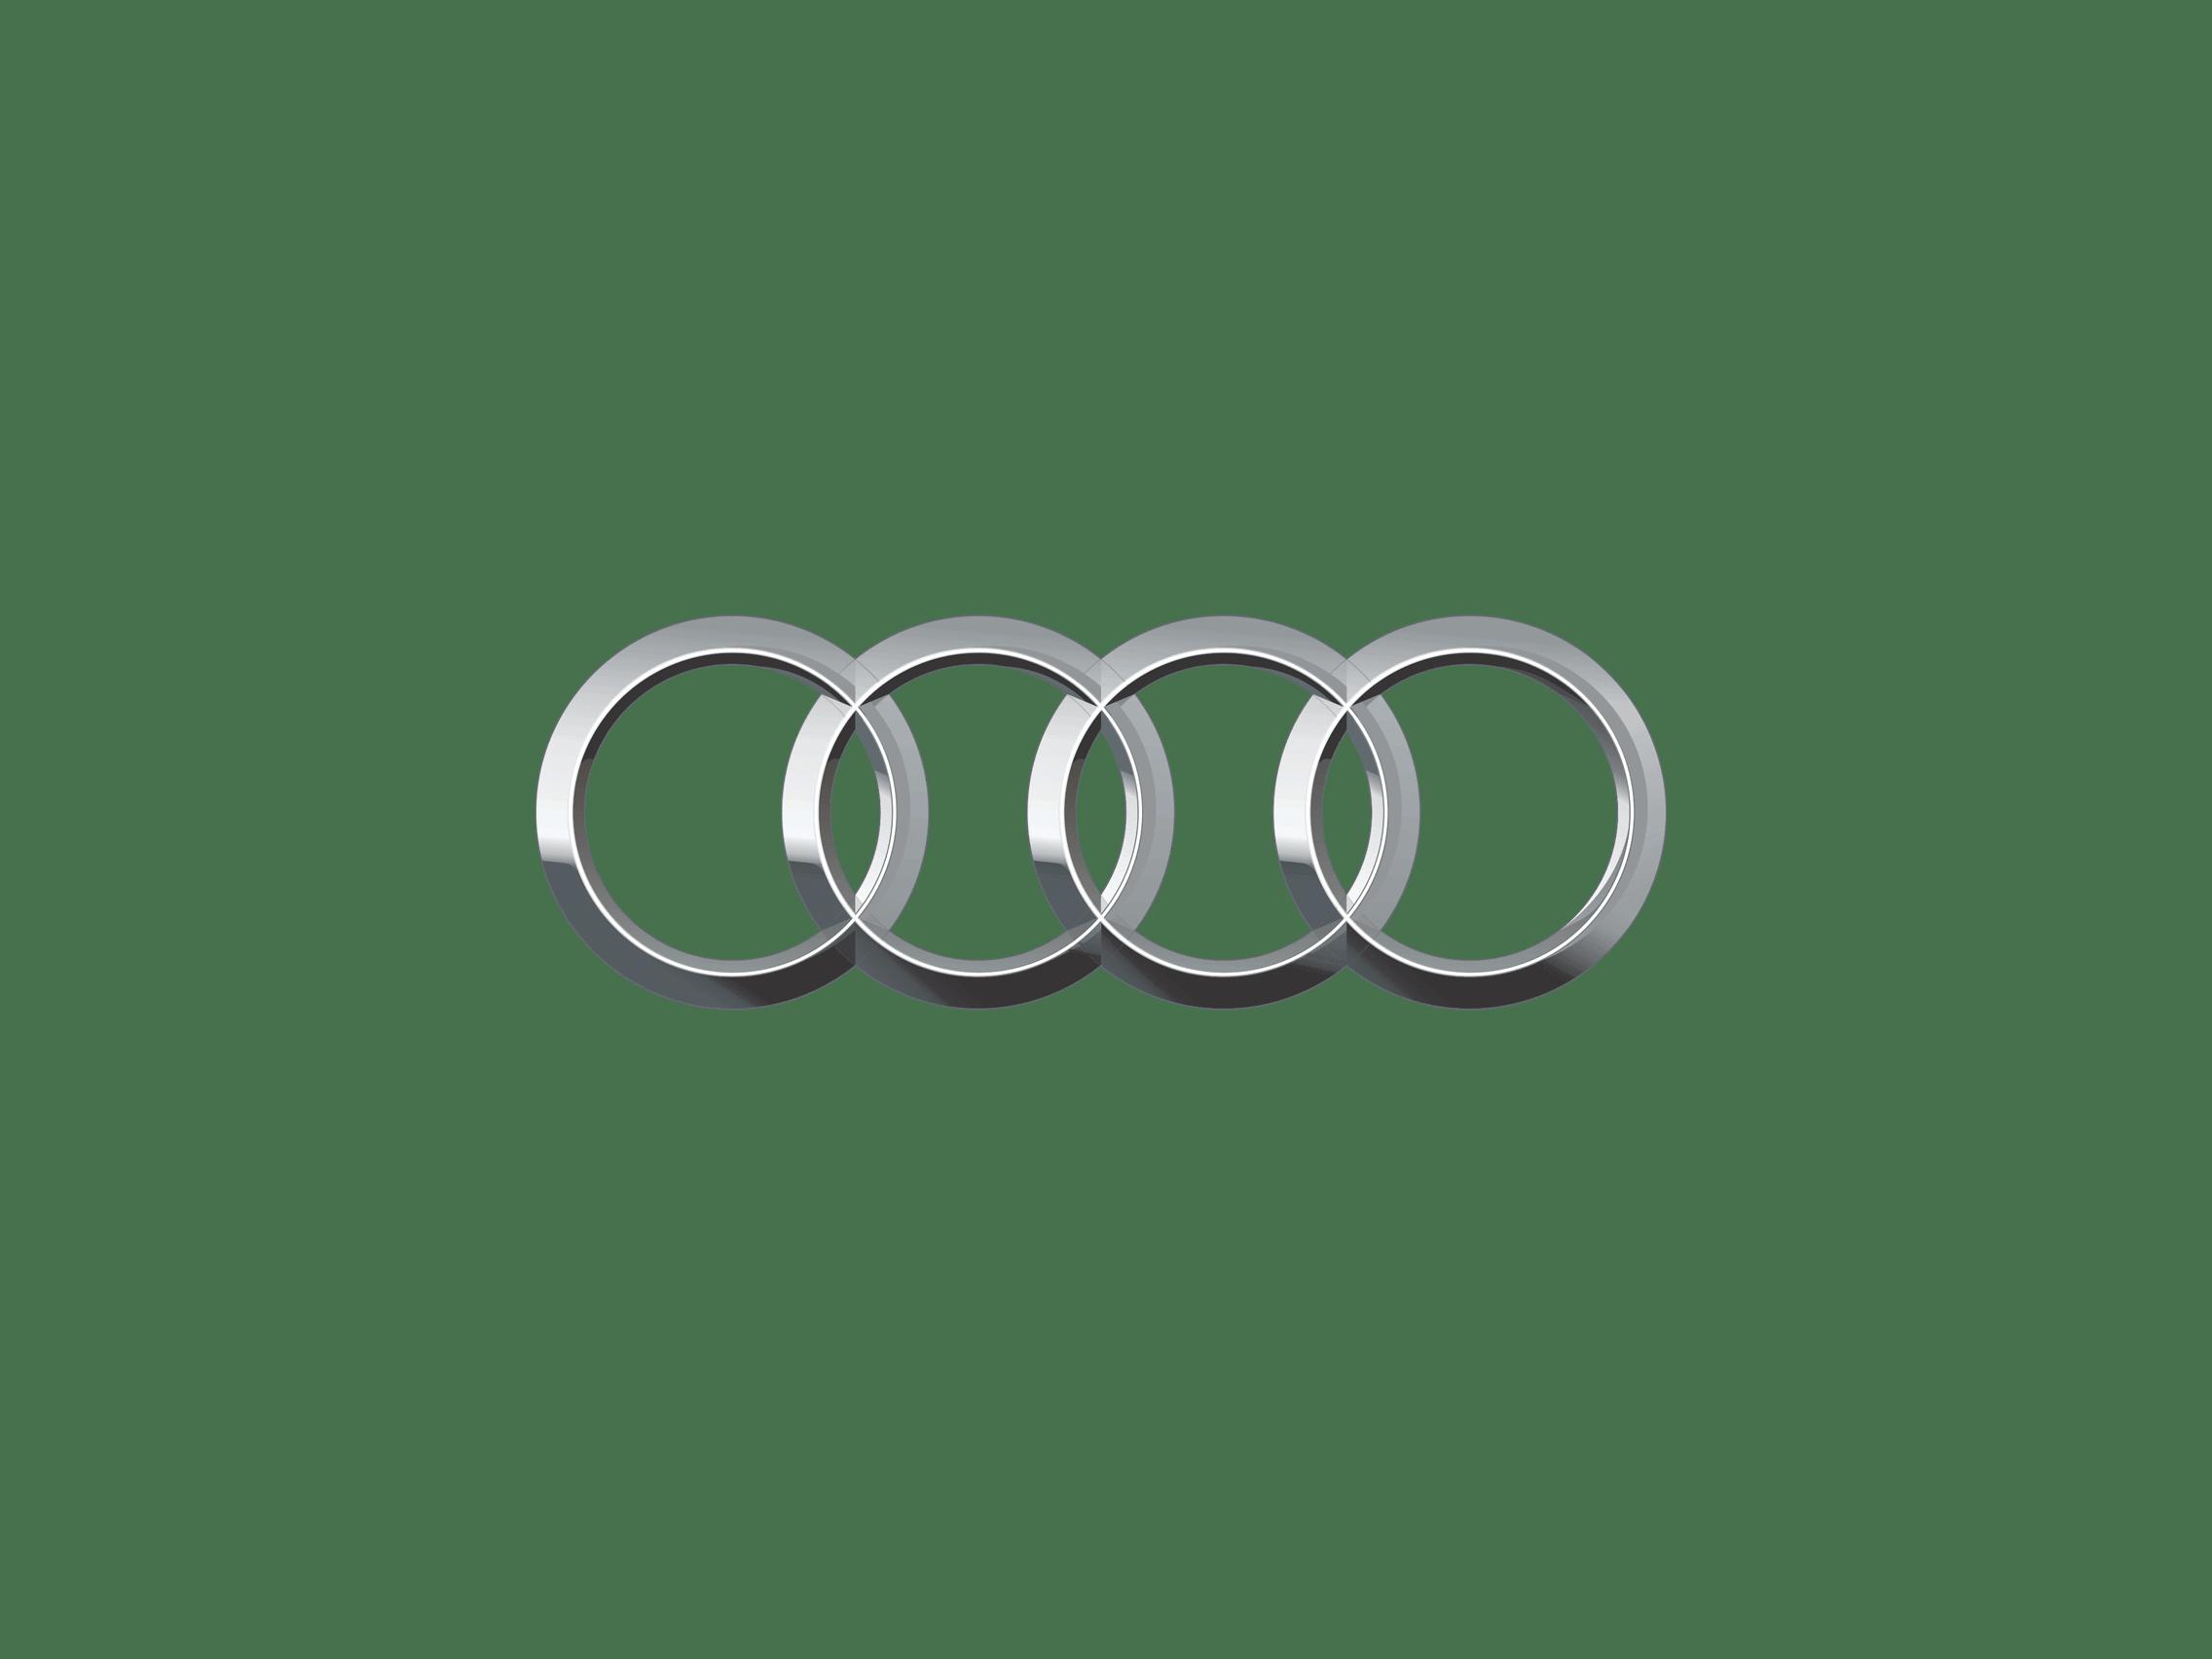 Audi Car Hd Wallpaper Download Audi Logo Png Free Transparent Png Logos